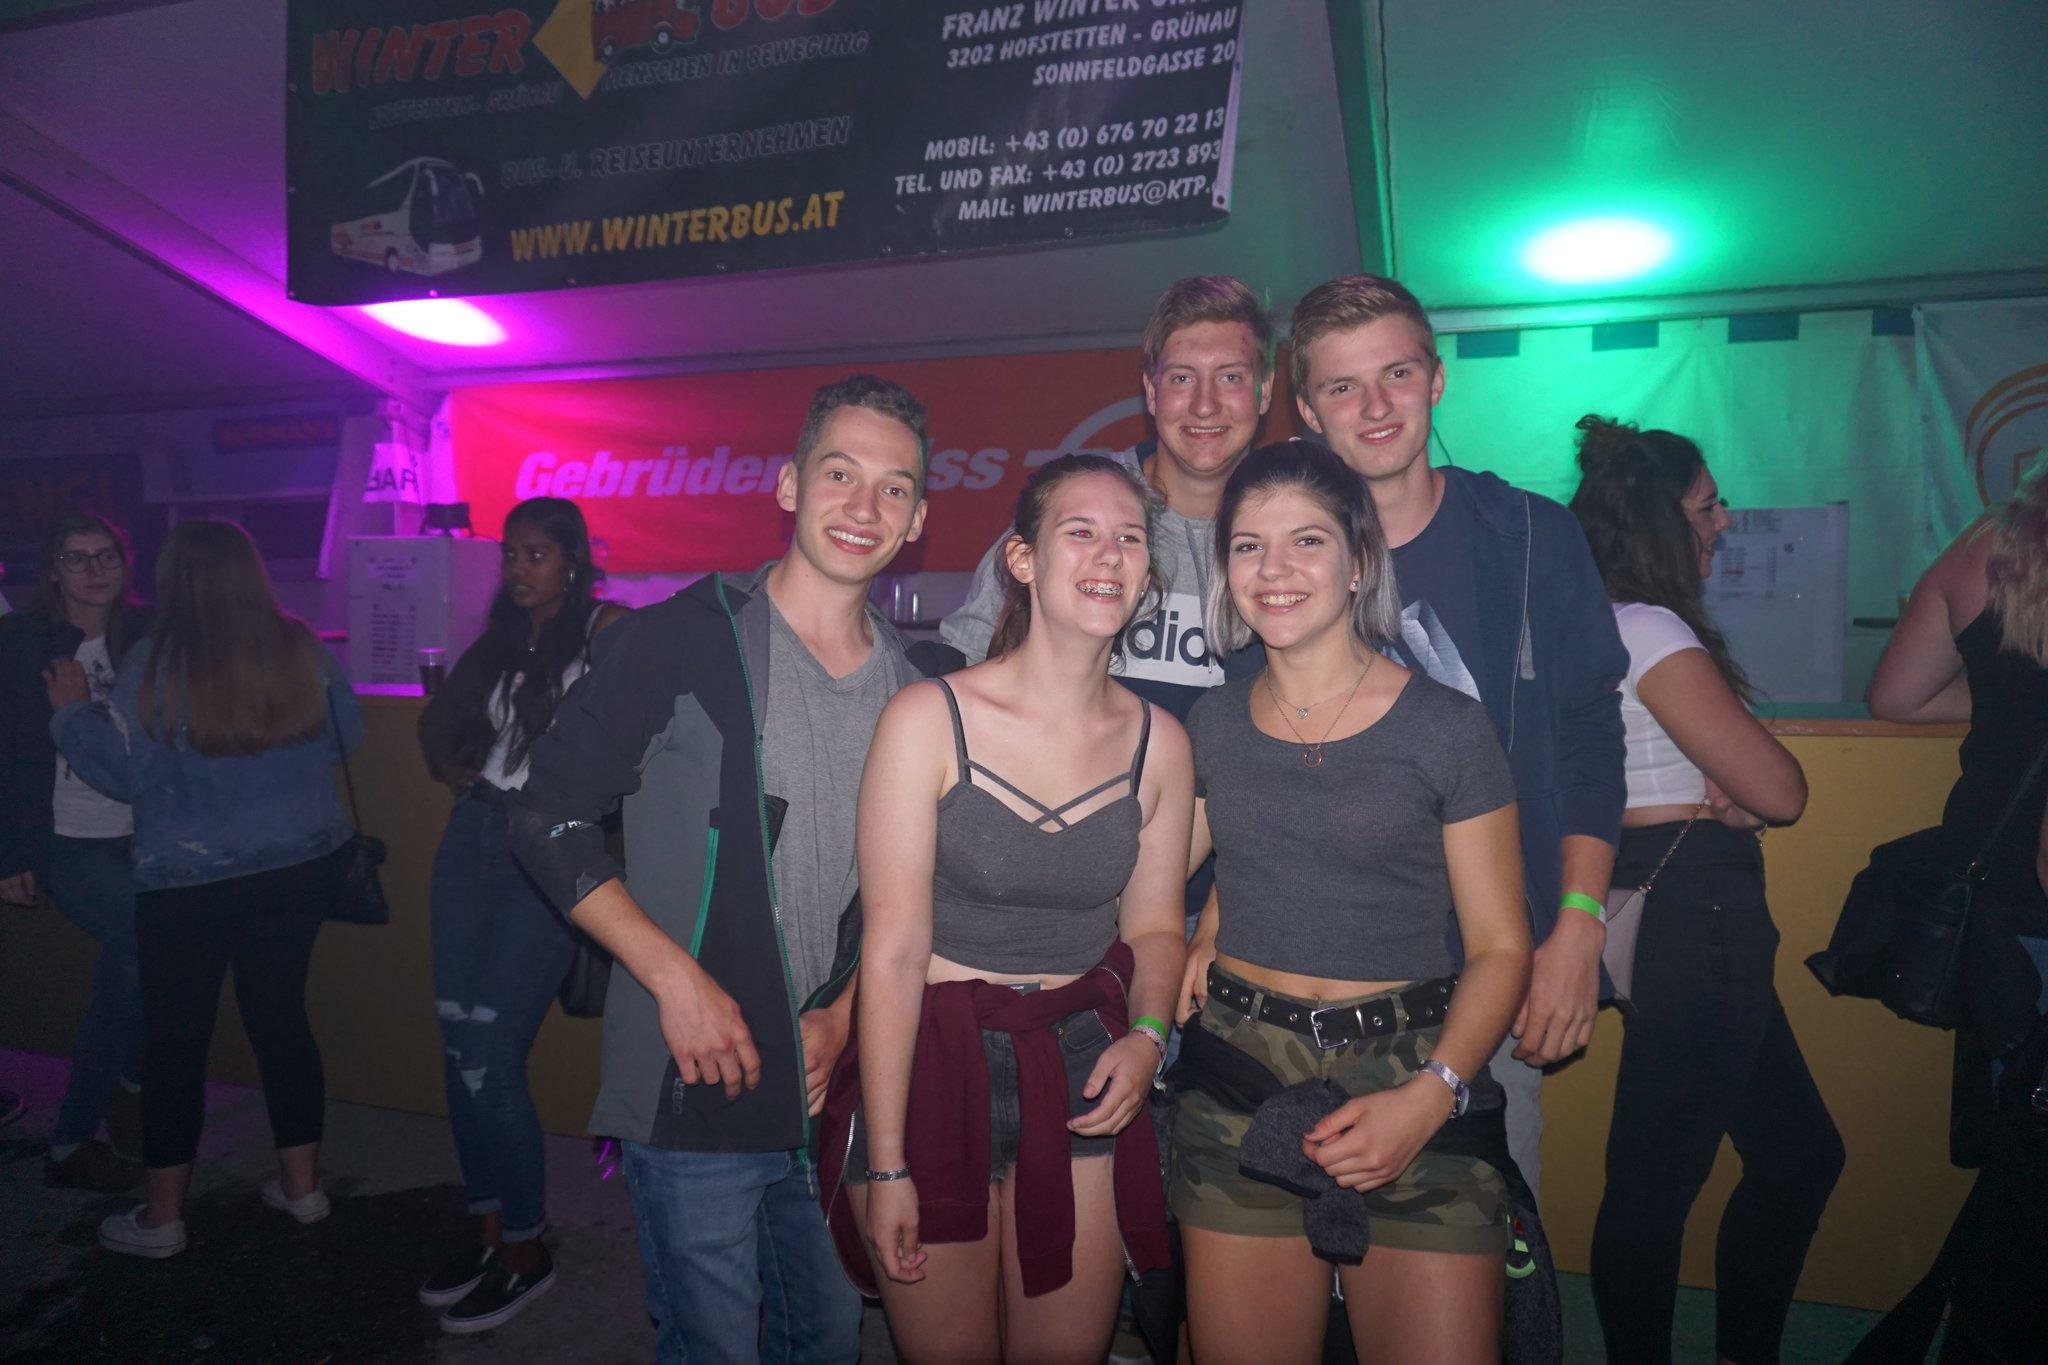 Online Chat & Dating Hofstetten-Grnau | Lerne Mnner